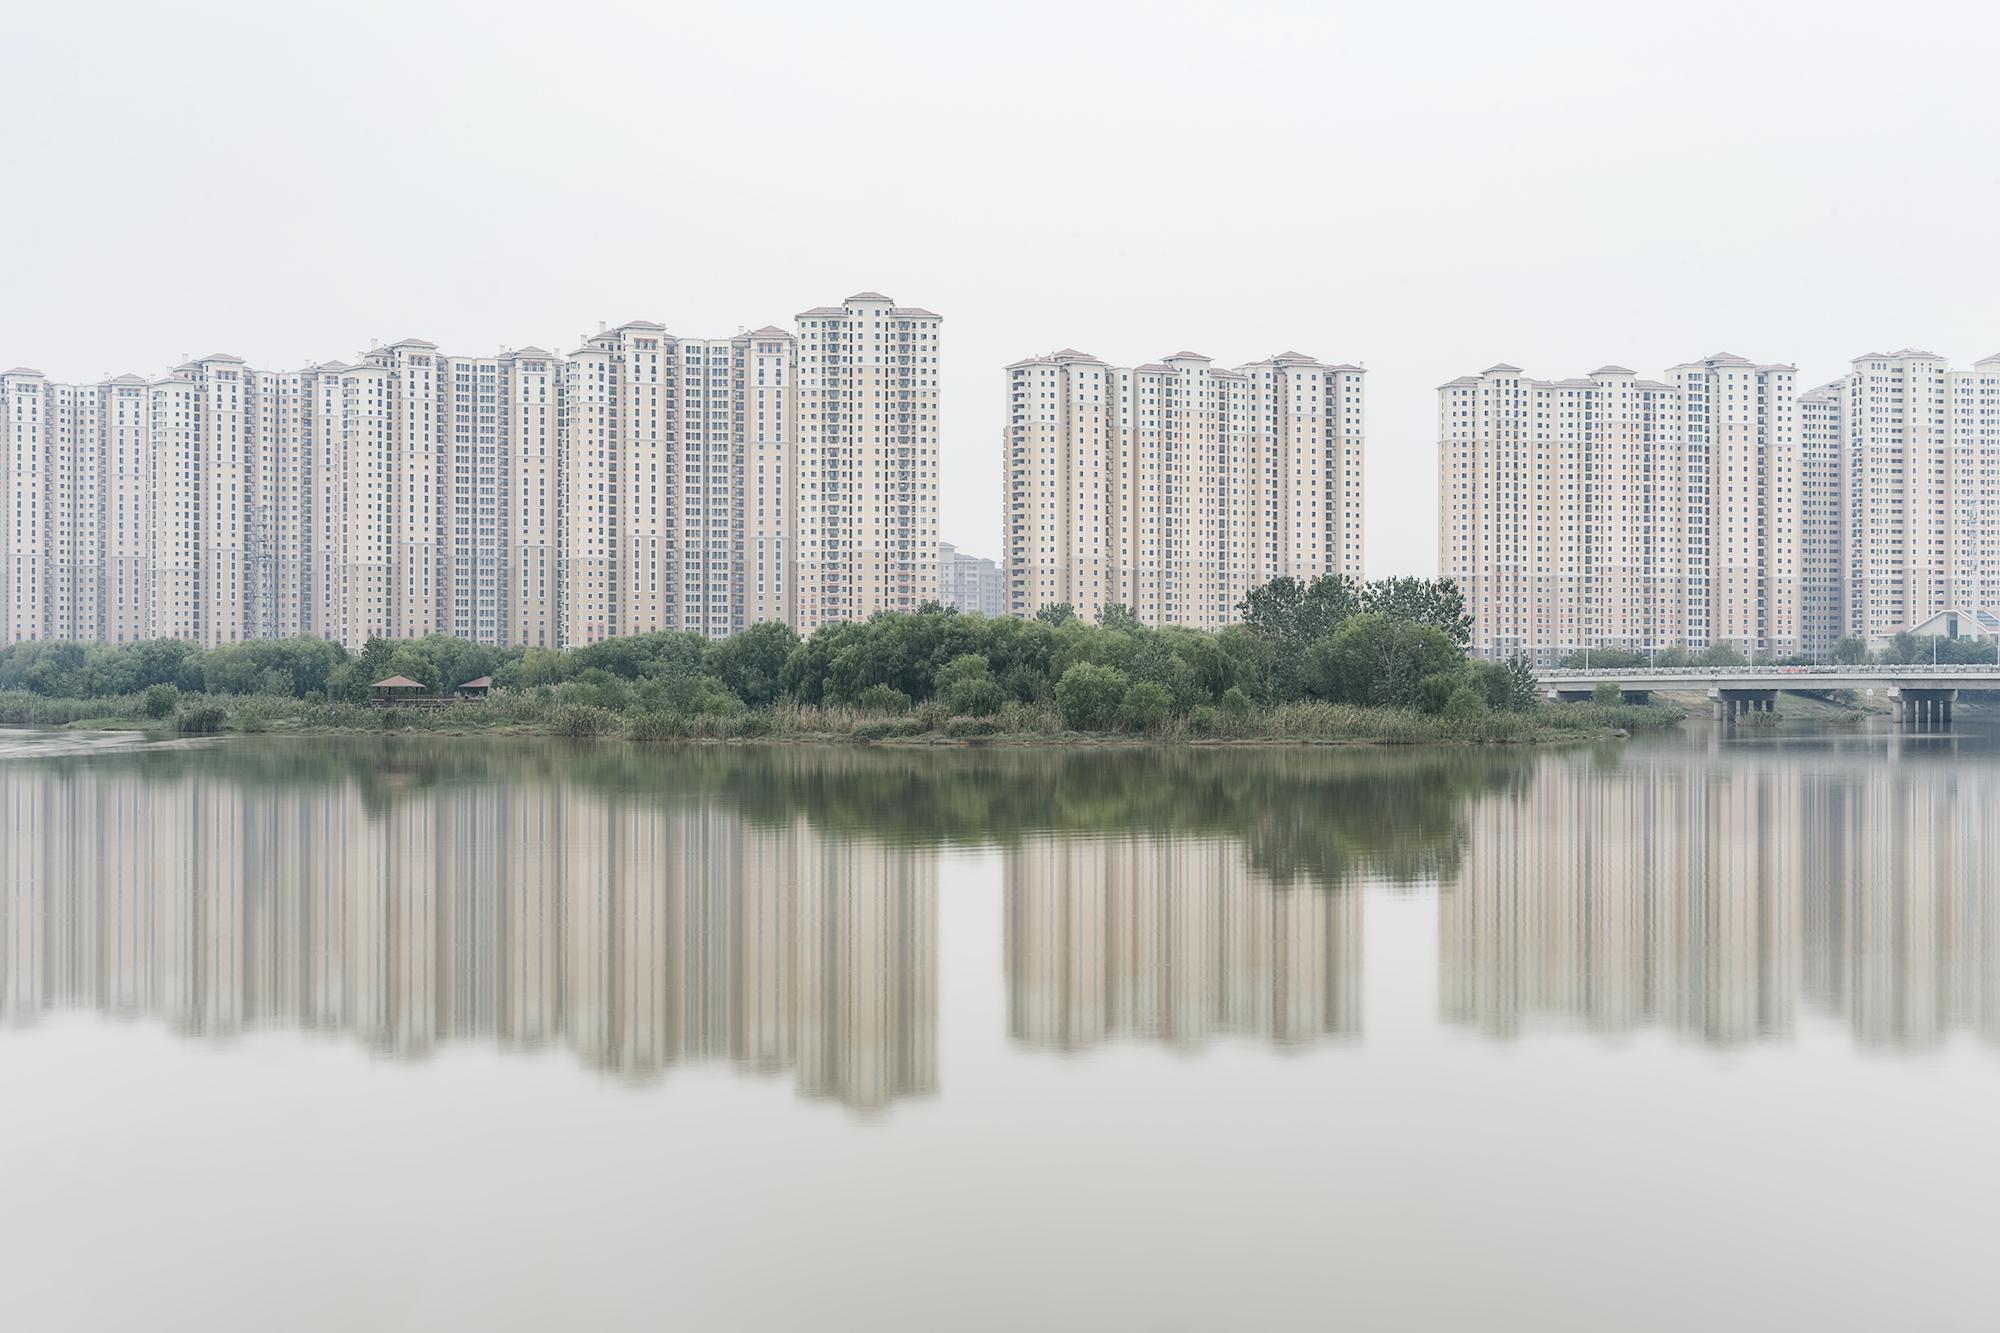 - Brand New Hope,Nanjing,201660 x 40 cmInkjet print on Fine Art PaperEdition of 7View all Alessandro Zanoni's fine prints